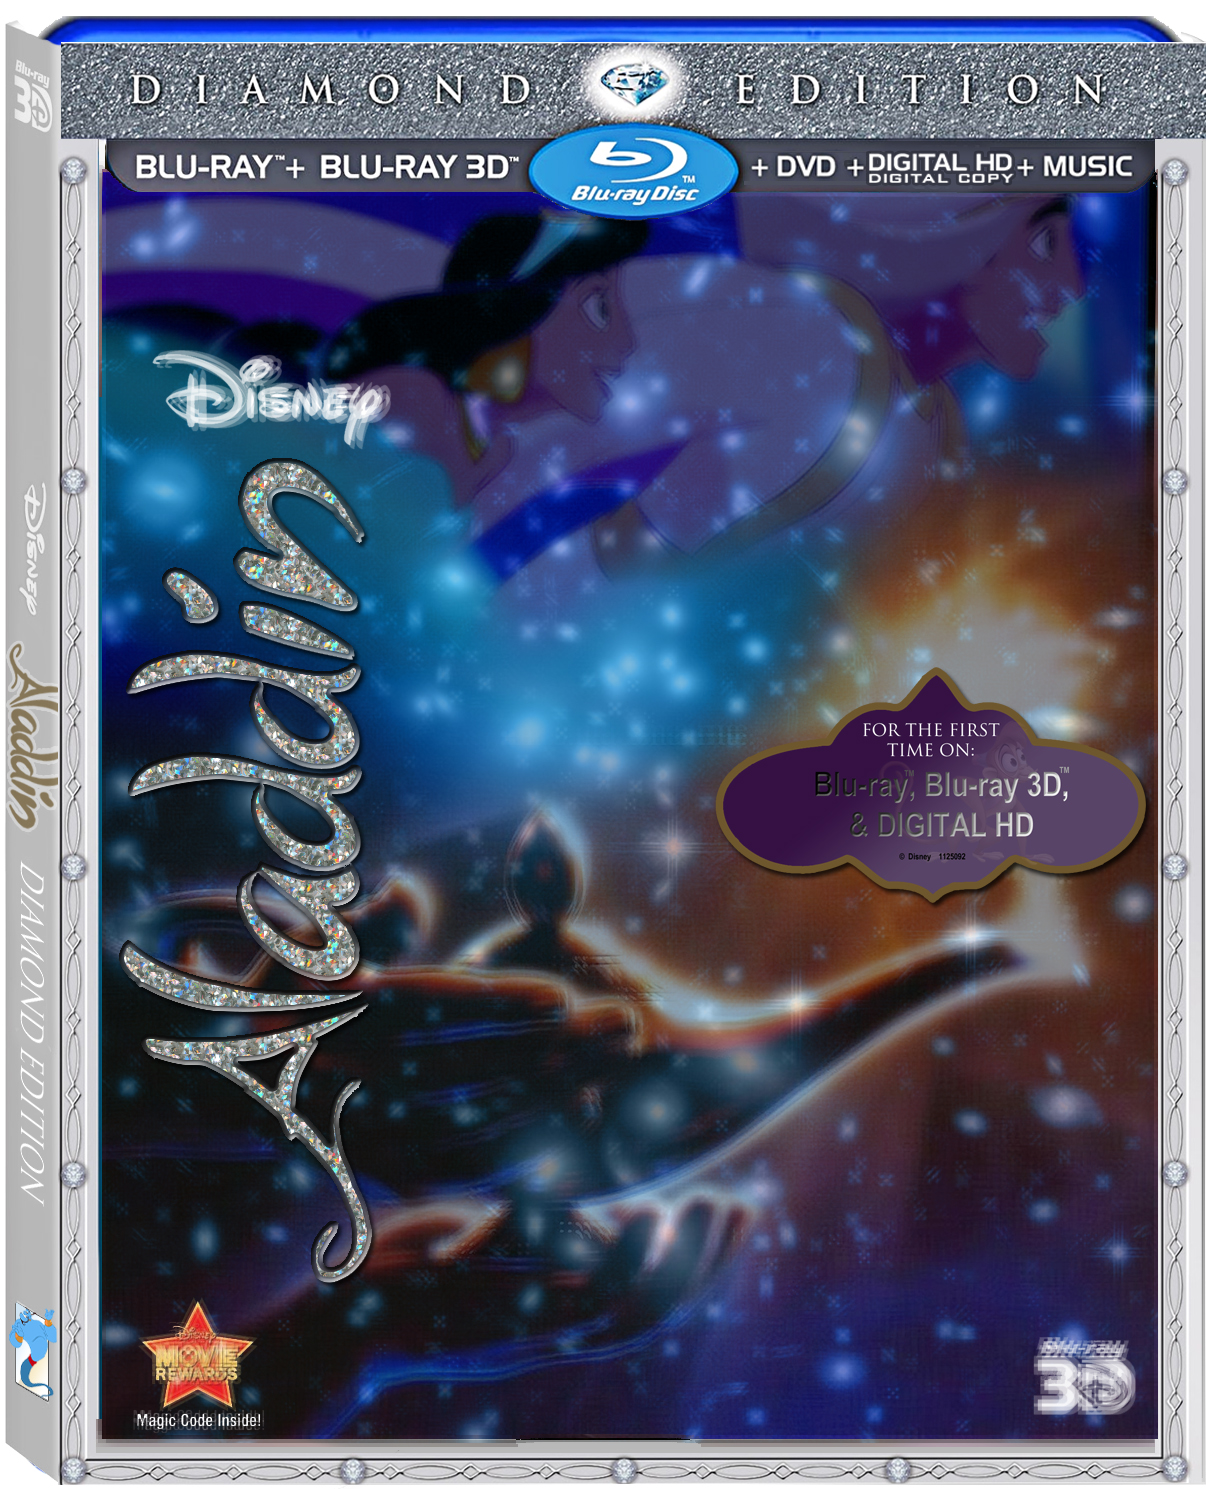 Edition Diamond: Aladdin: 20th Anniversary Diamond Edition Blu-ray